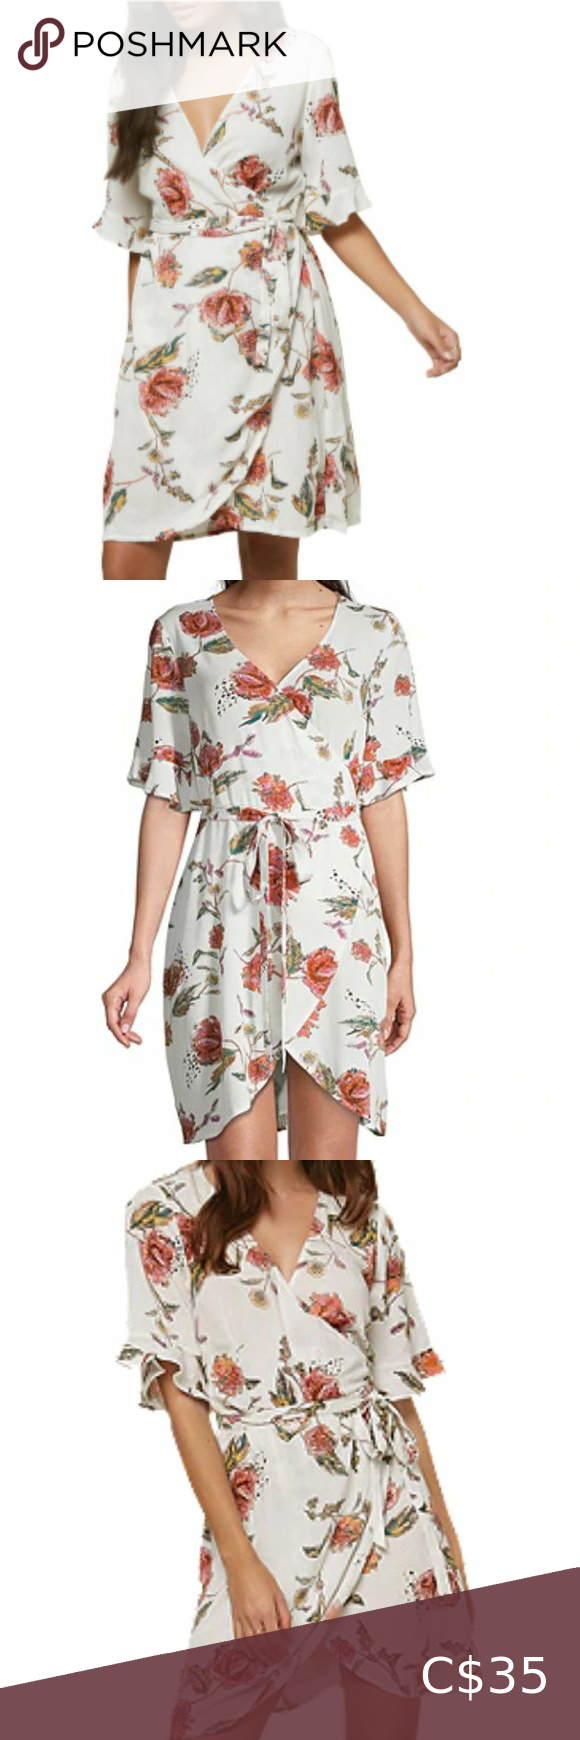 Short Sleeve Mini Wrap Dress Mini Wrap Dress Wrap Dress Fashion [ 2940 x 2100 Pixel ]